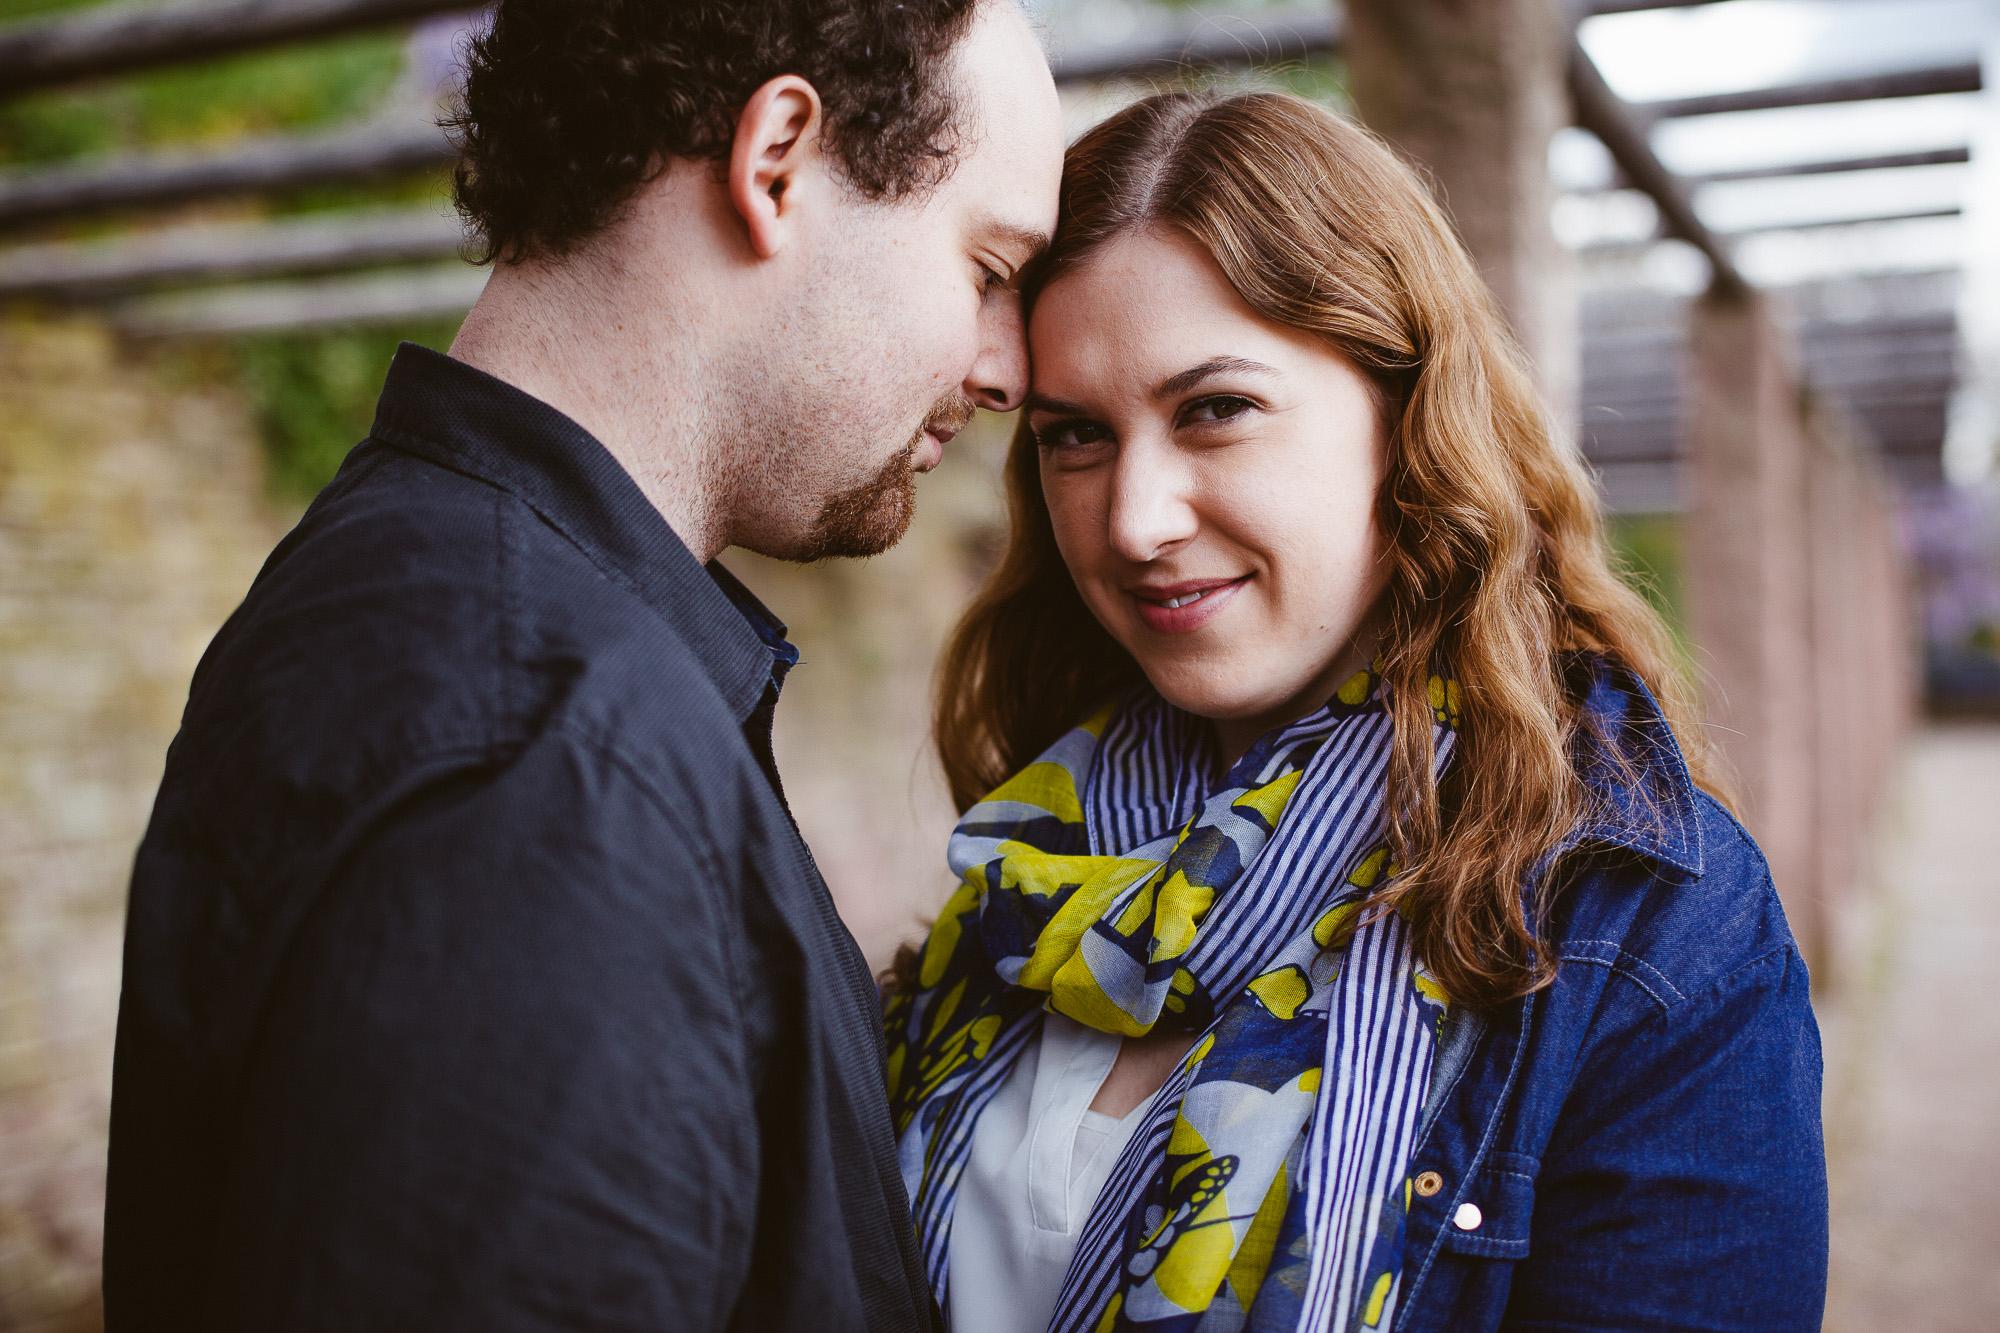 Helen-und-Sebastian-Engagement-by-Avec-Amis-2